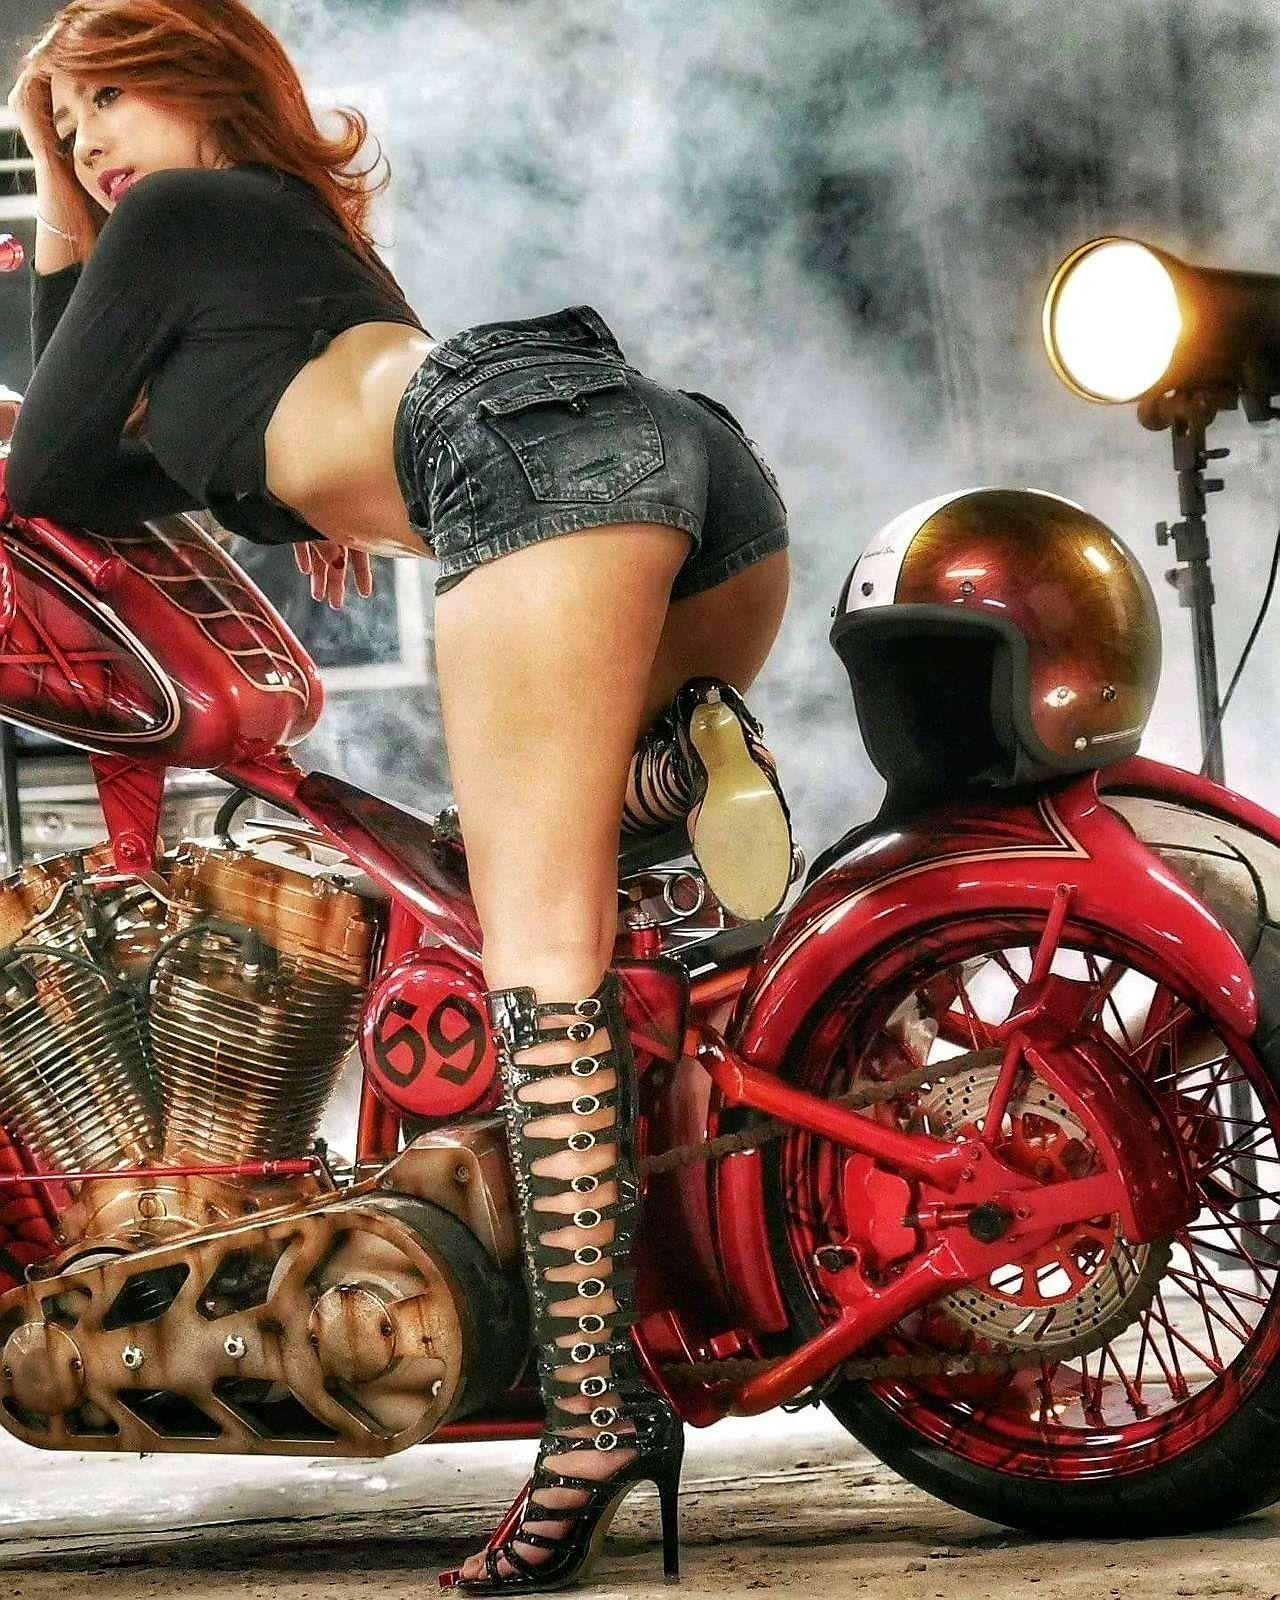 Tits pics hardcore biker girls porn